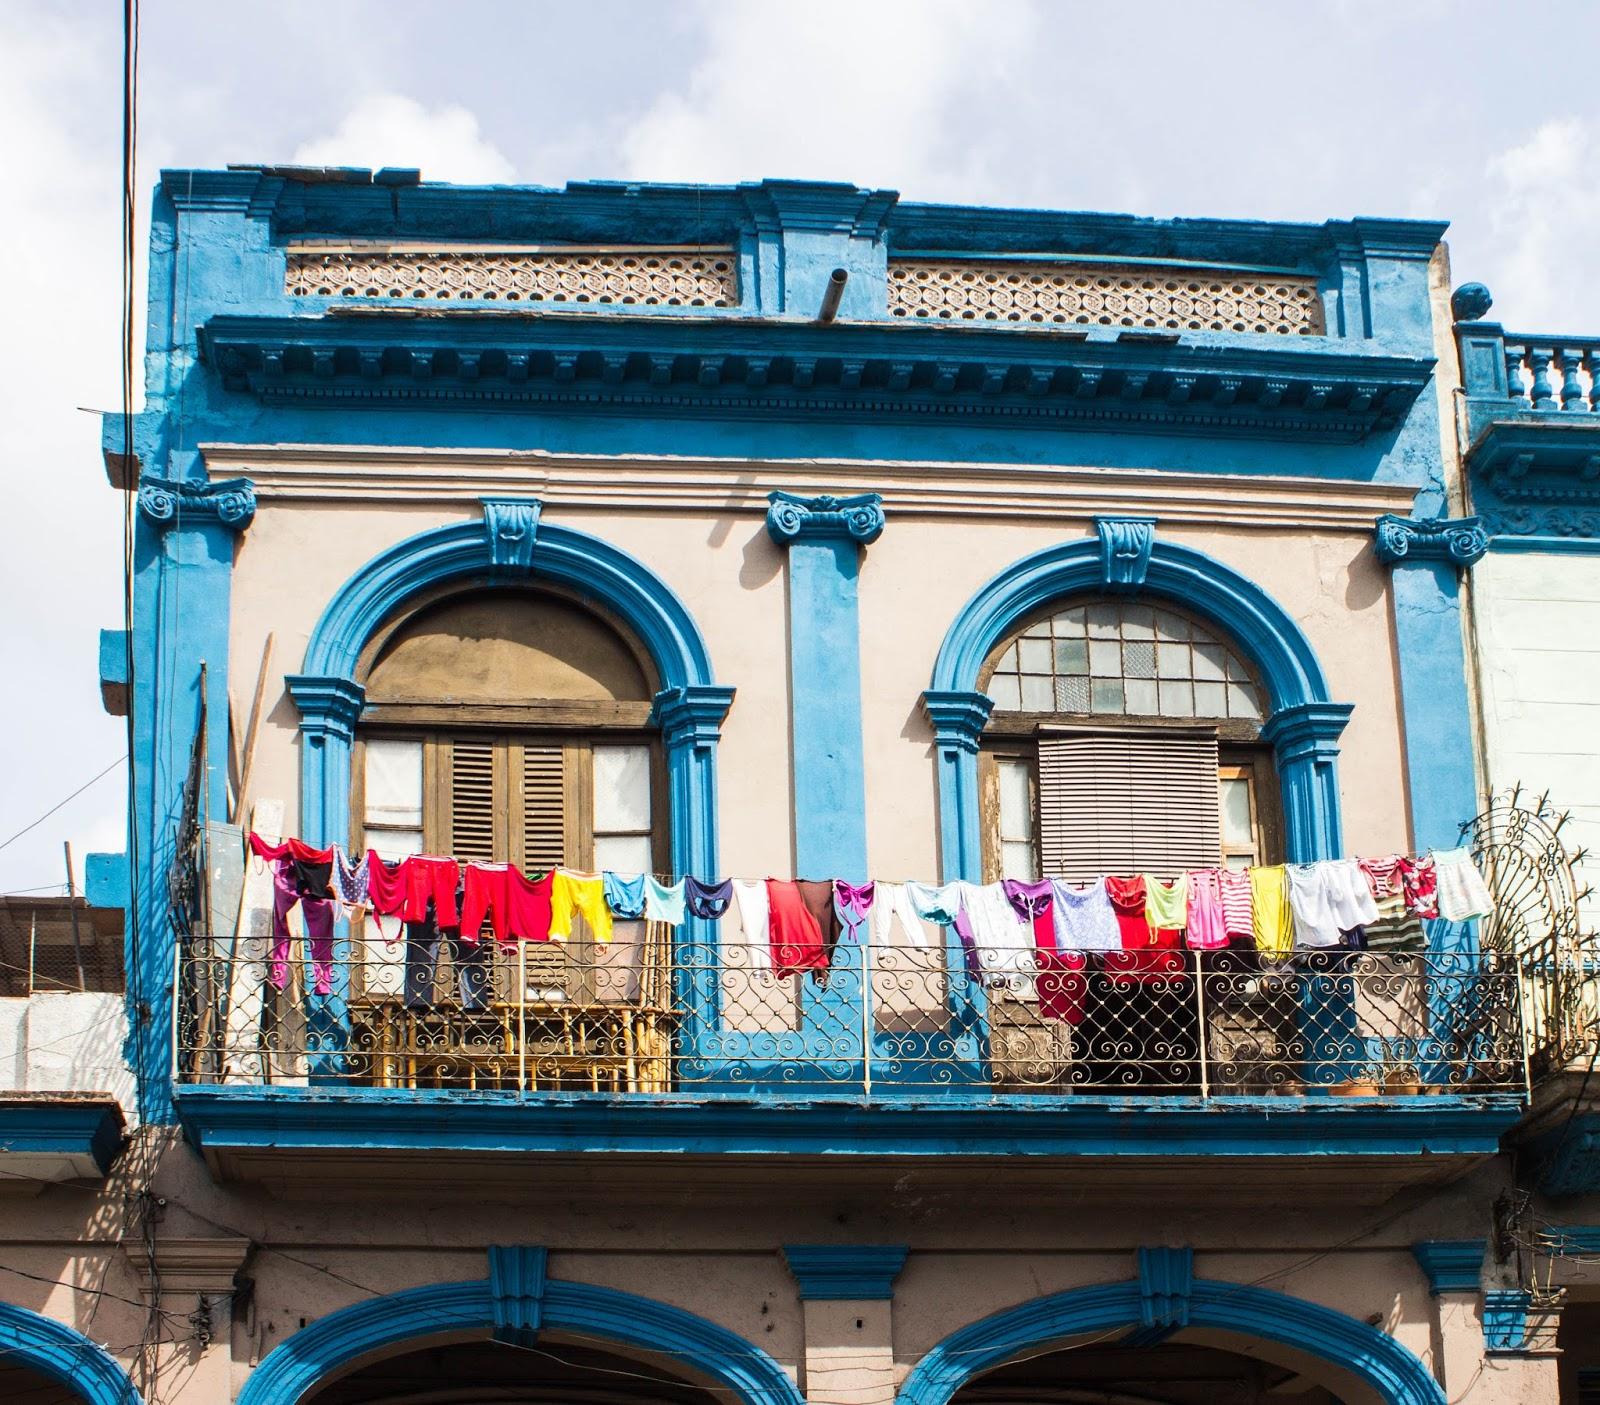 Cuba_Havana_Travelling_Todo_3